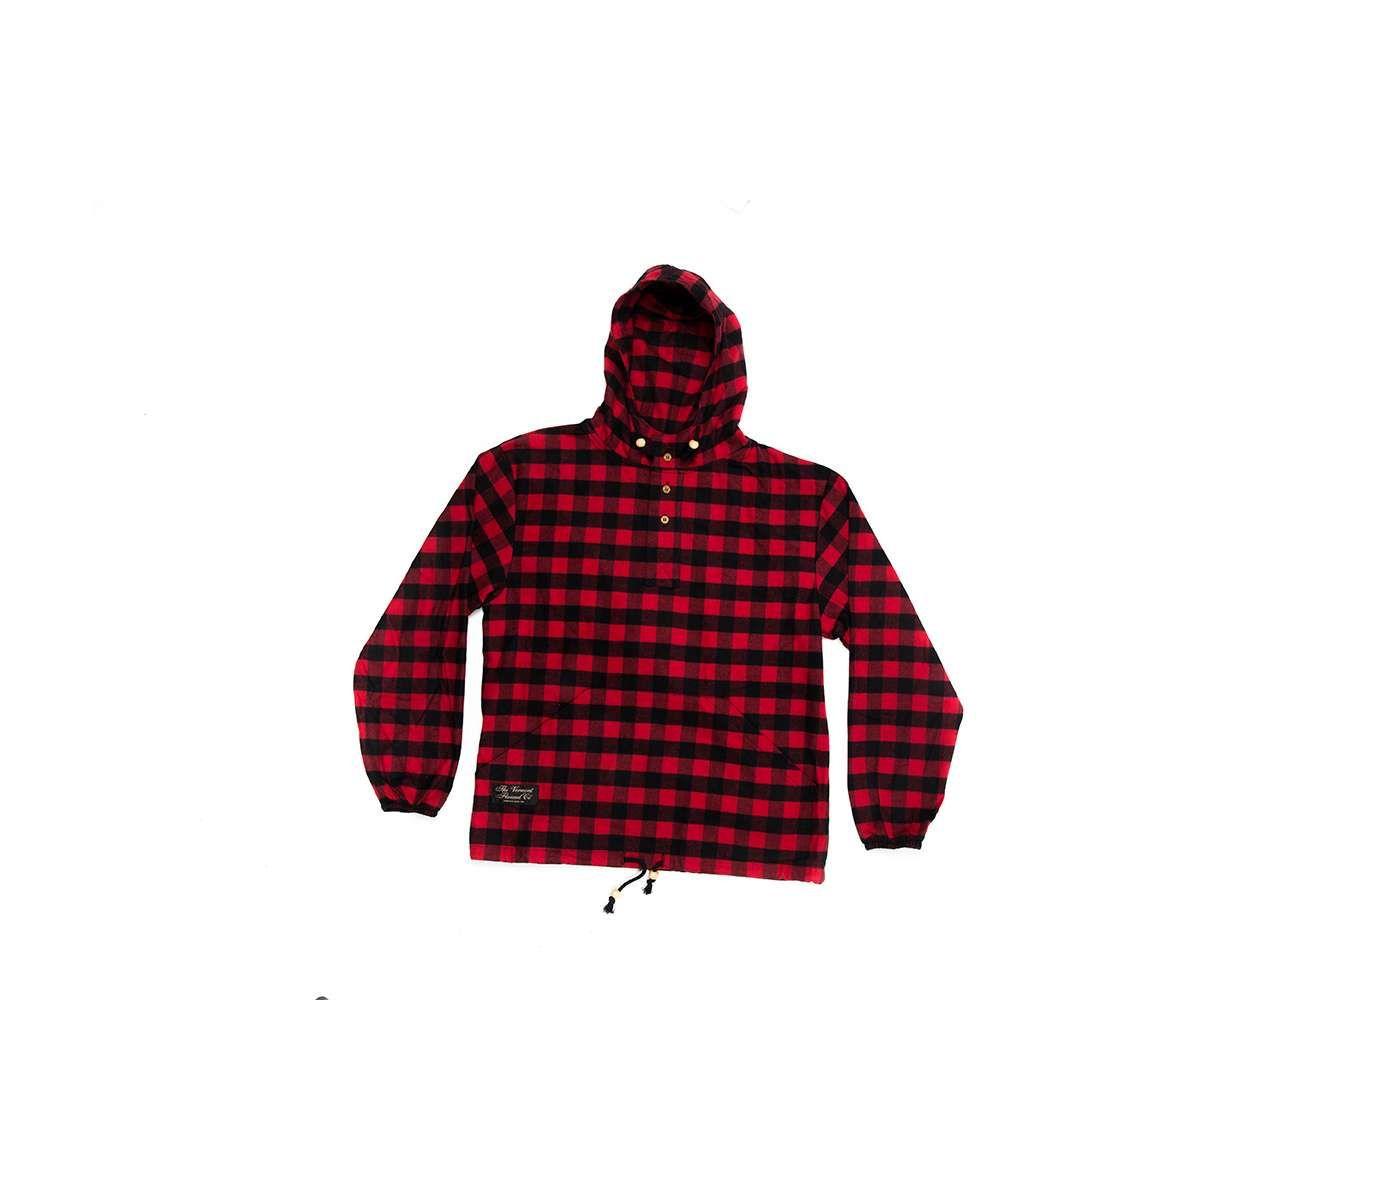 f02f2da104eeb Baa Haa Hooded Flannel Pullover - Vermont Flannel Co | Boy's Life ...